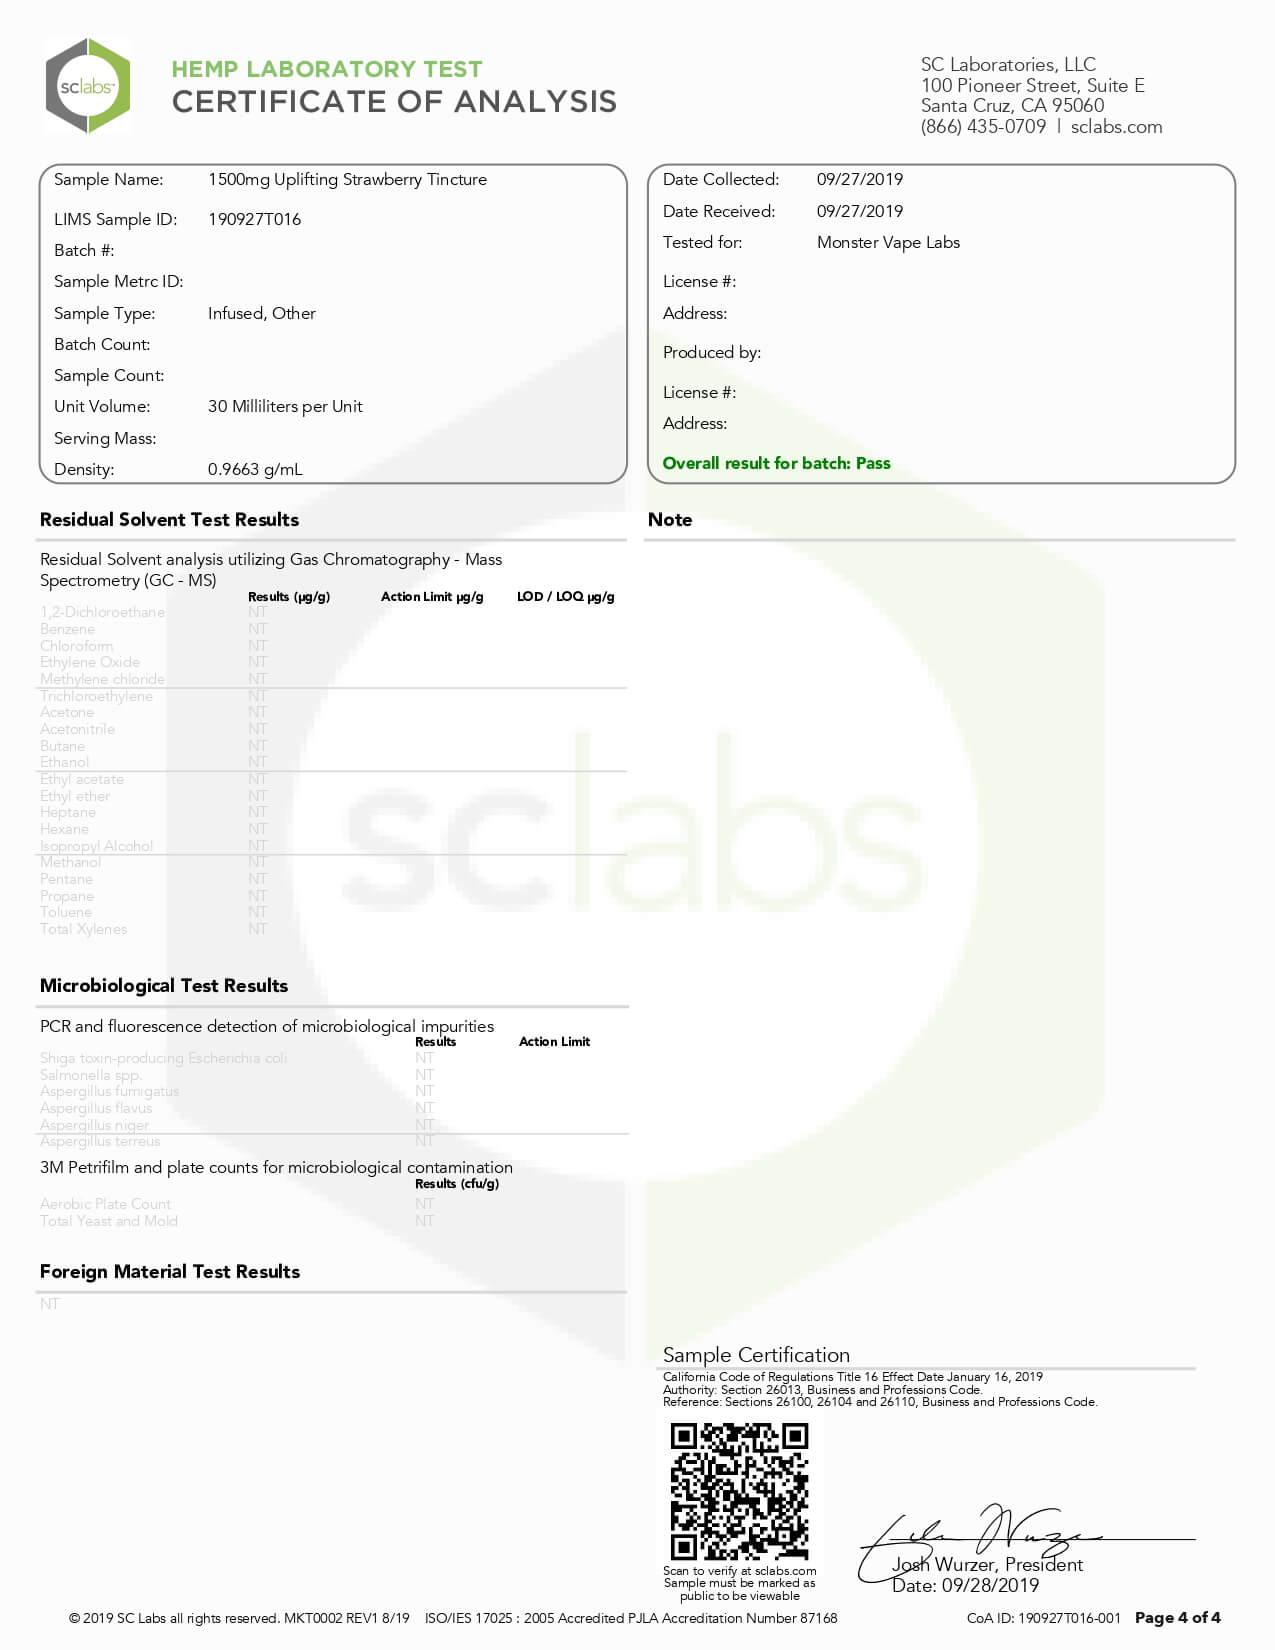 Hempcy CBD Tincture Uplifting Strawberry 1500mg Lab Report